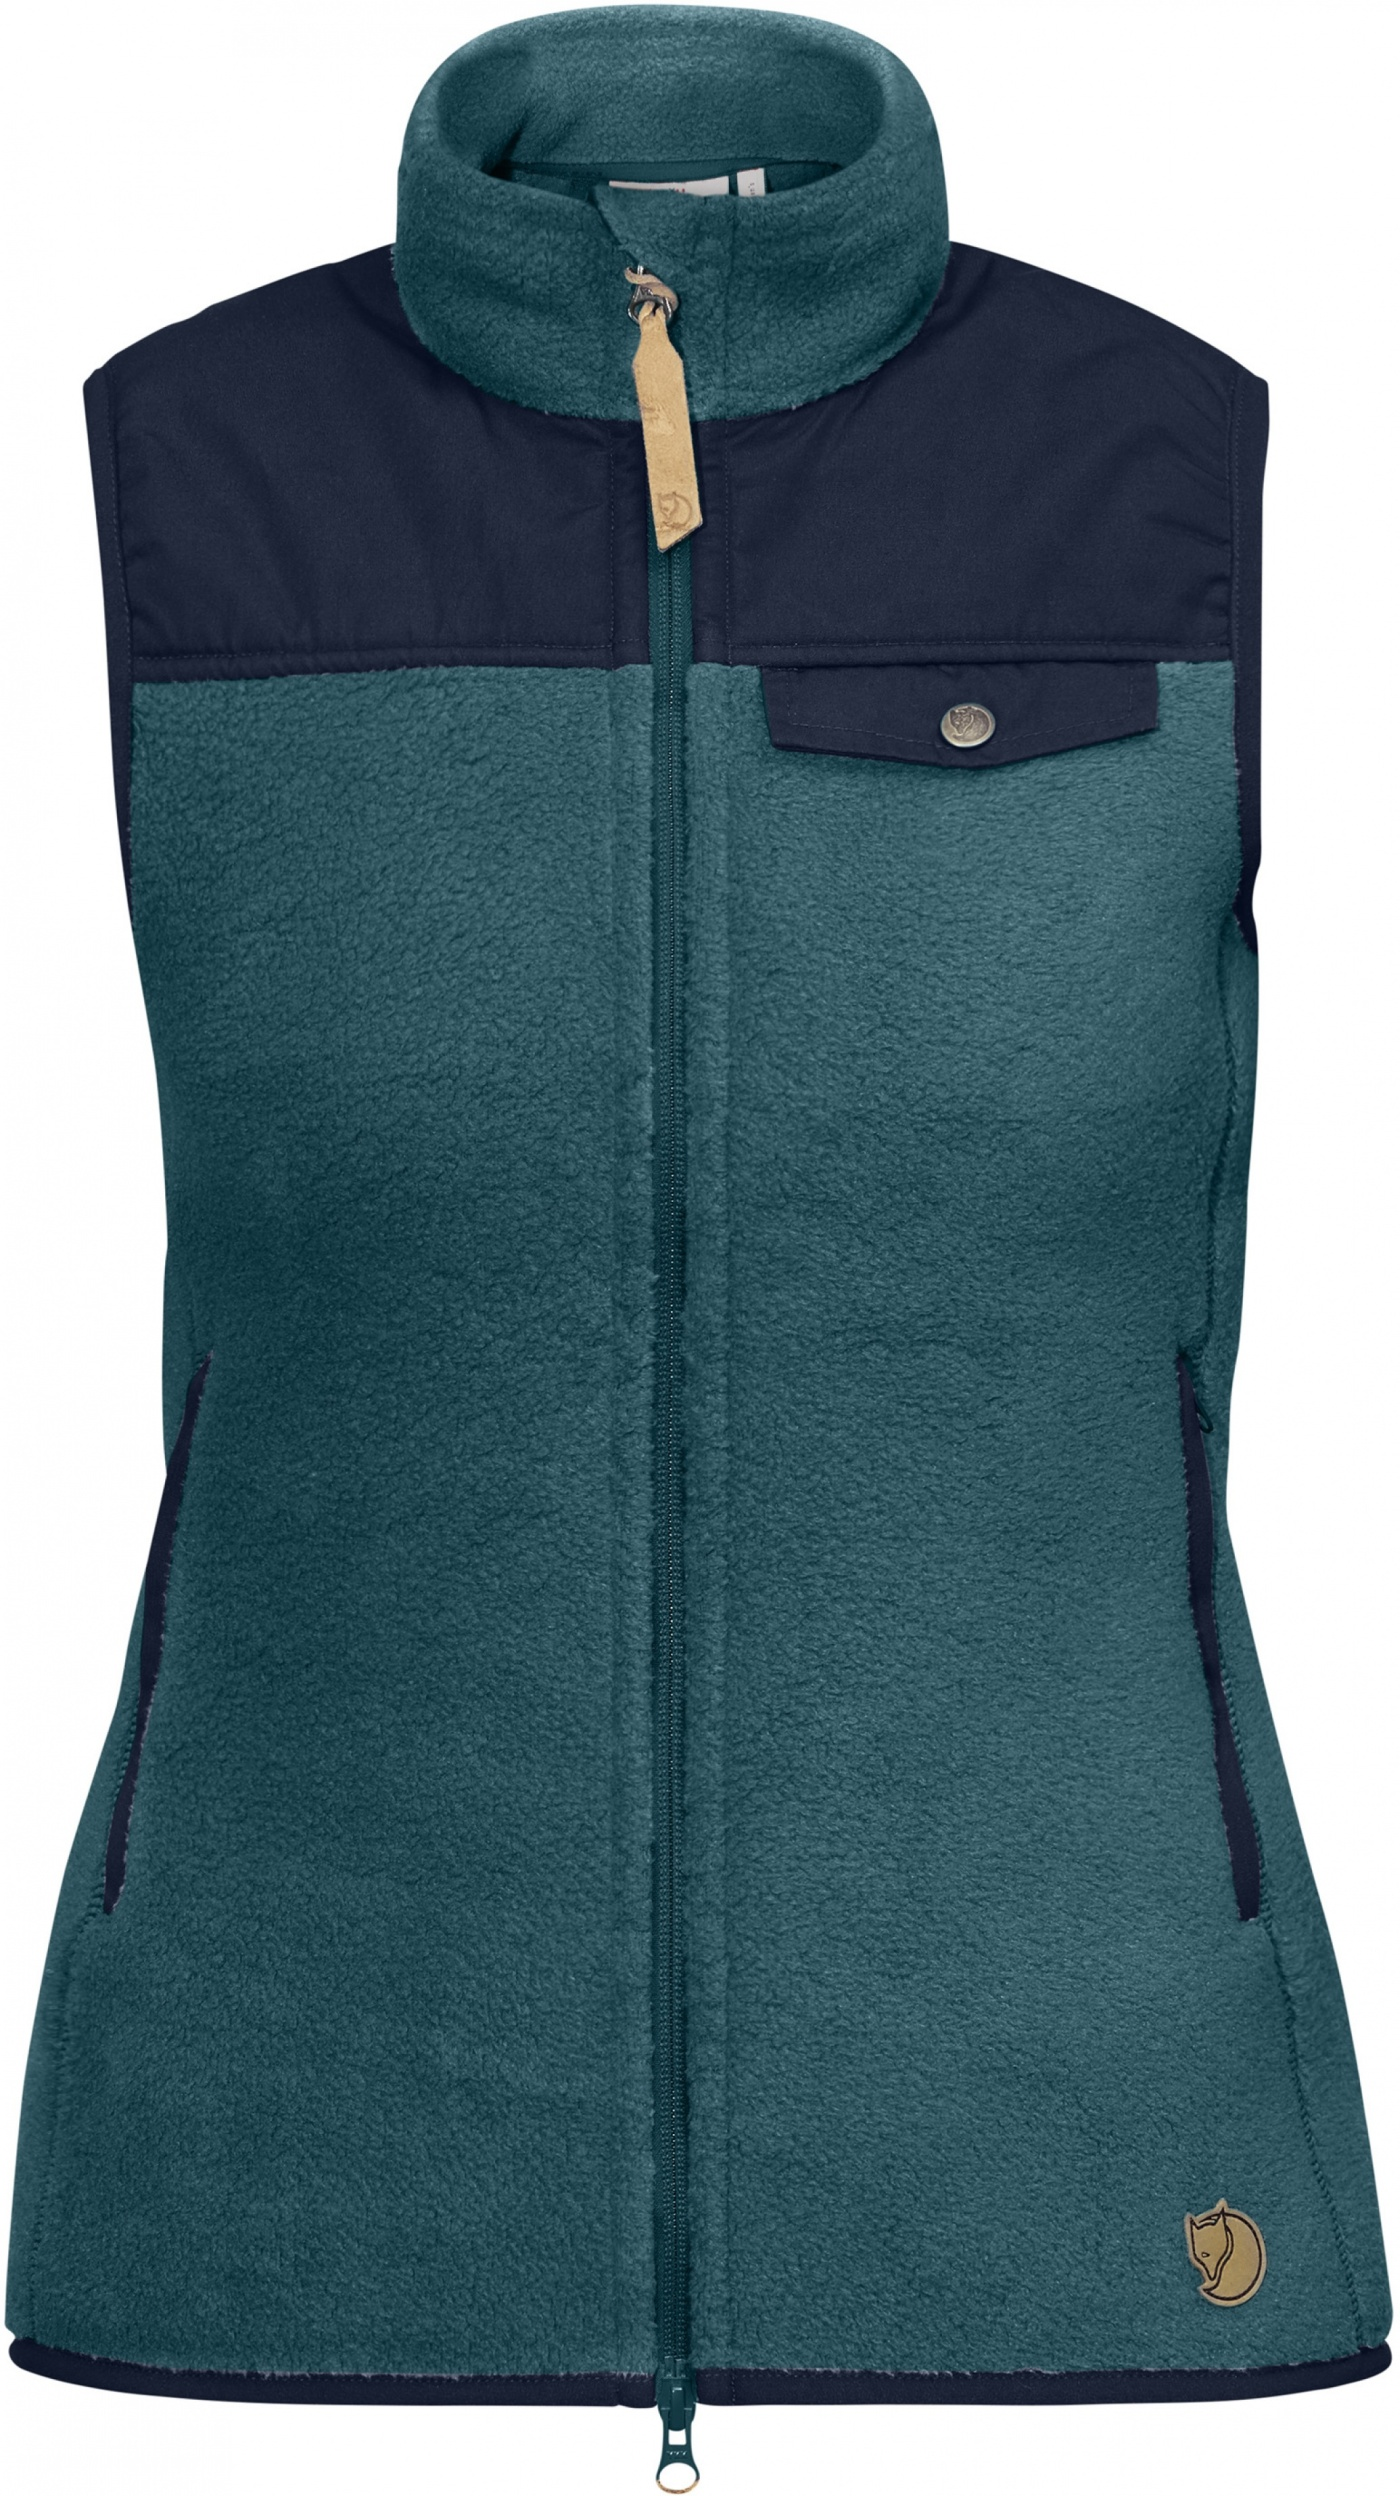 FjallRaven Singi Fleece Vest W Glacier Green-Dark Navy-30